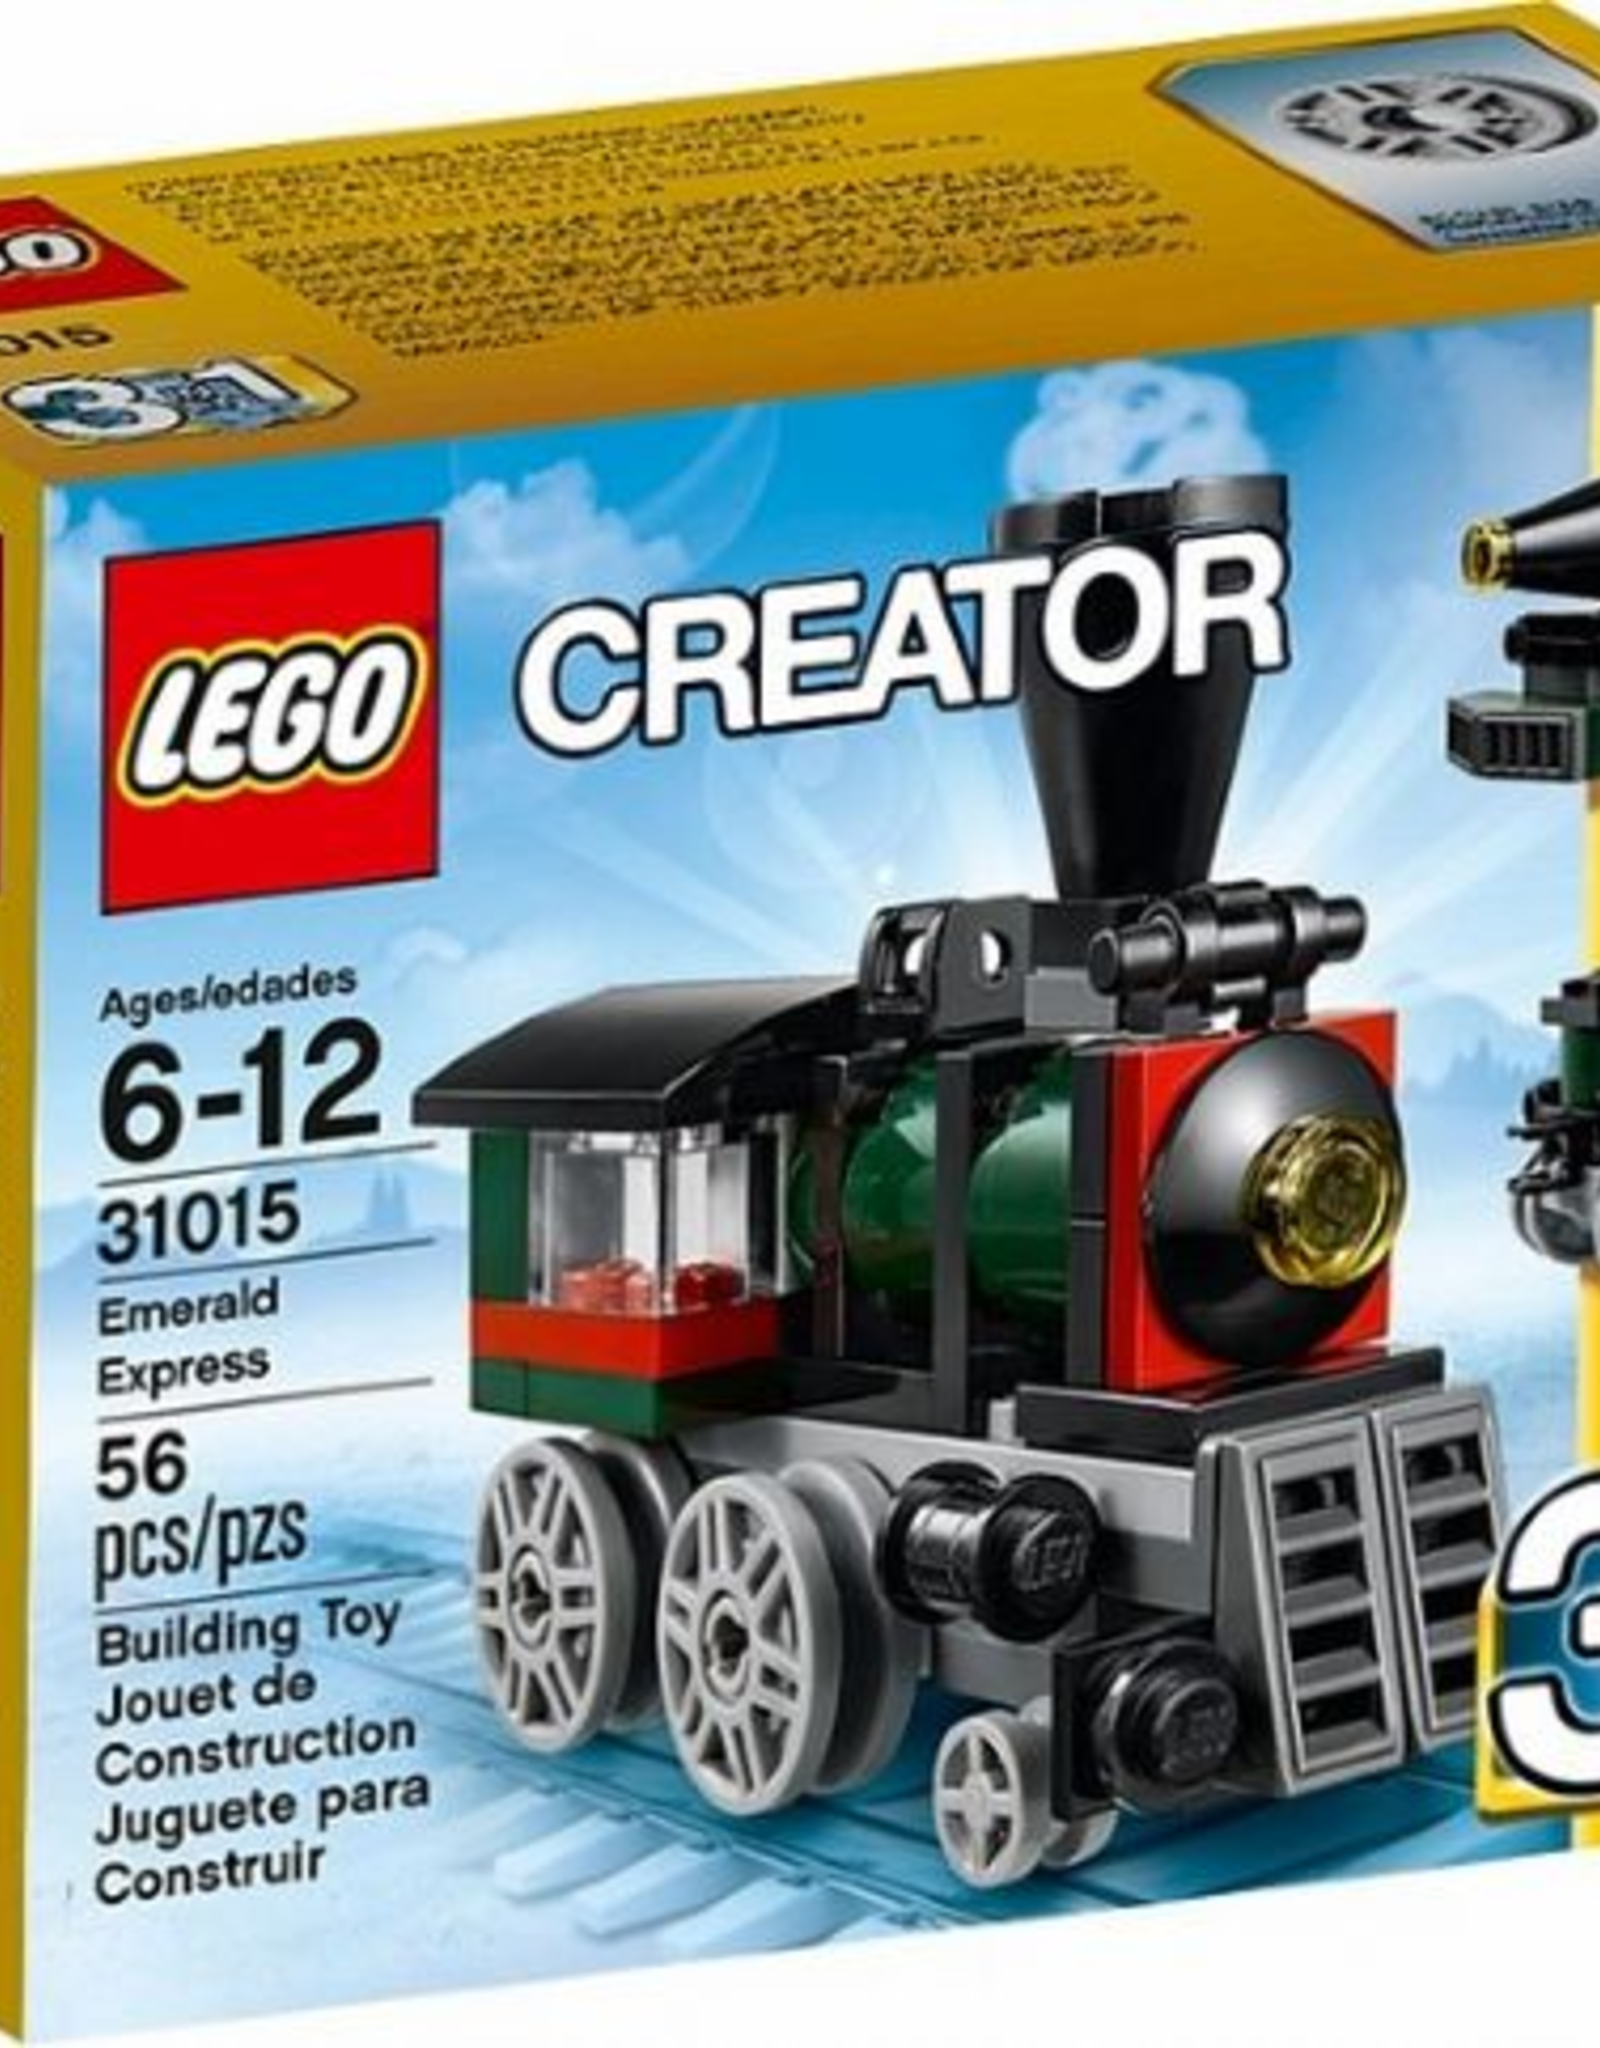 LEGO LEGO 31015 Emerald Express CREATOR